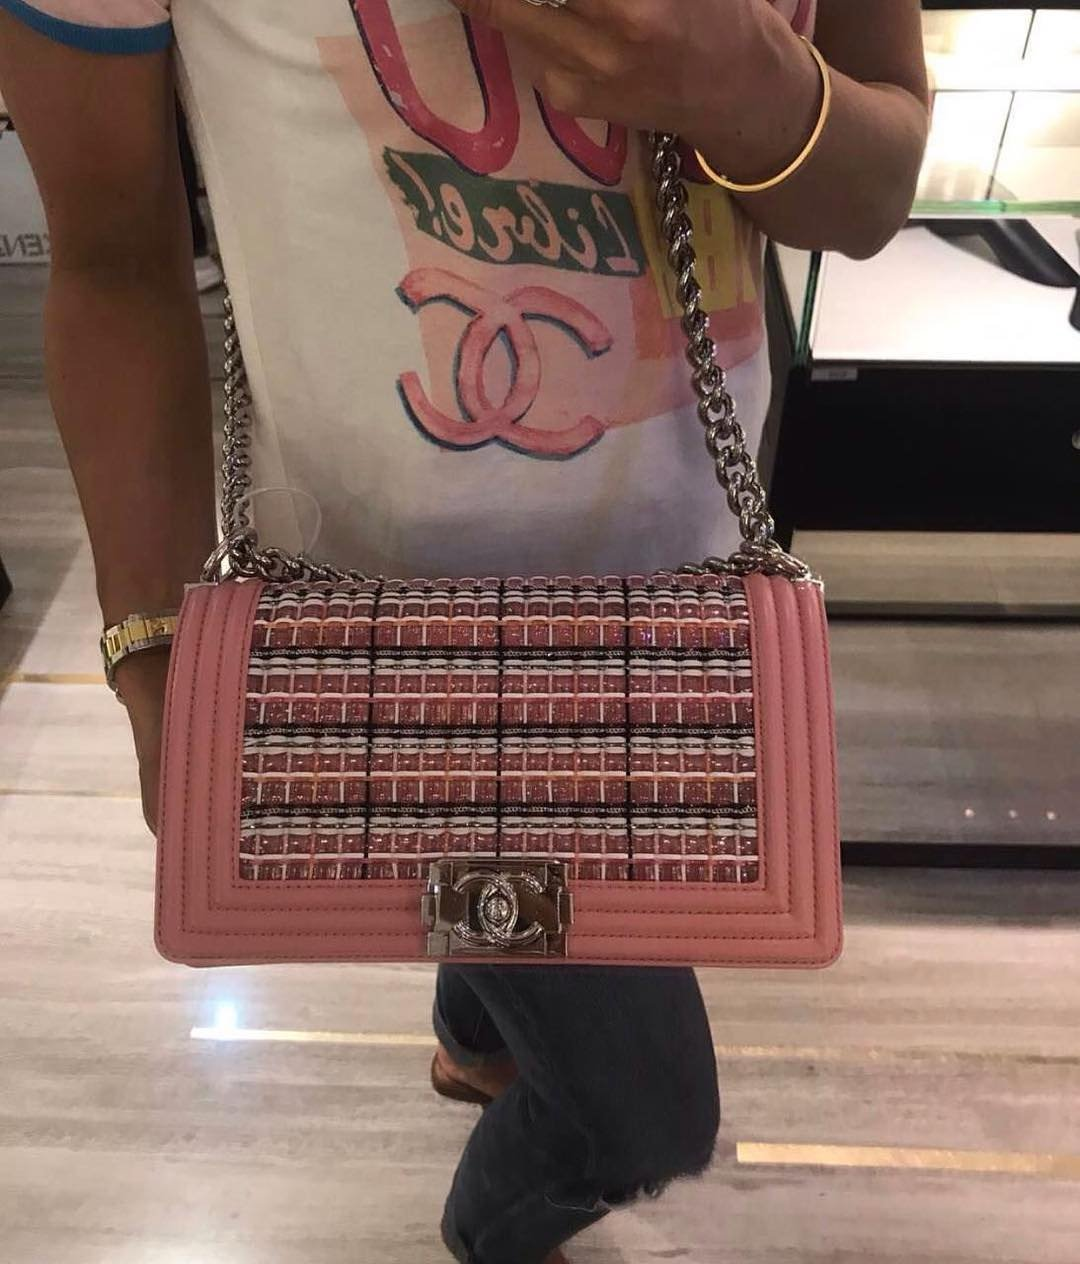 6a82e26bbc58 Boy Chanel PVC Thread Bag | Bragmybag